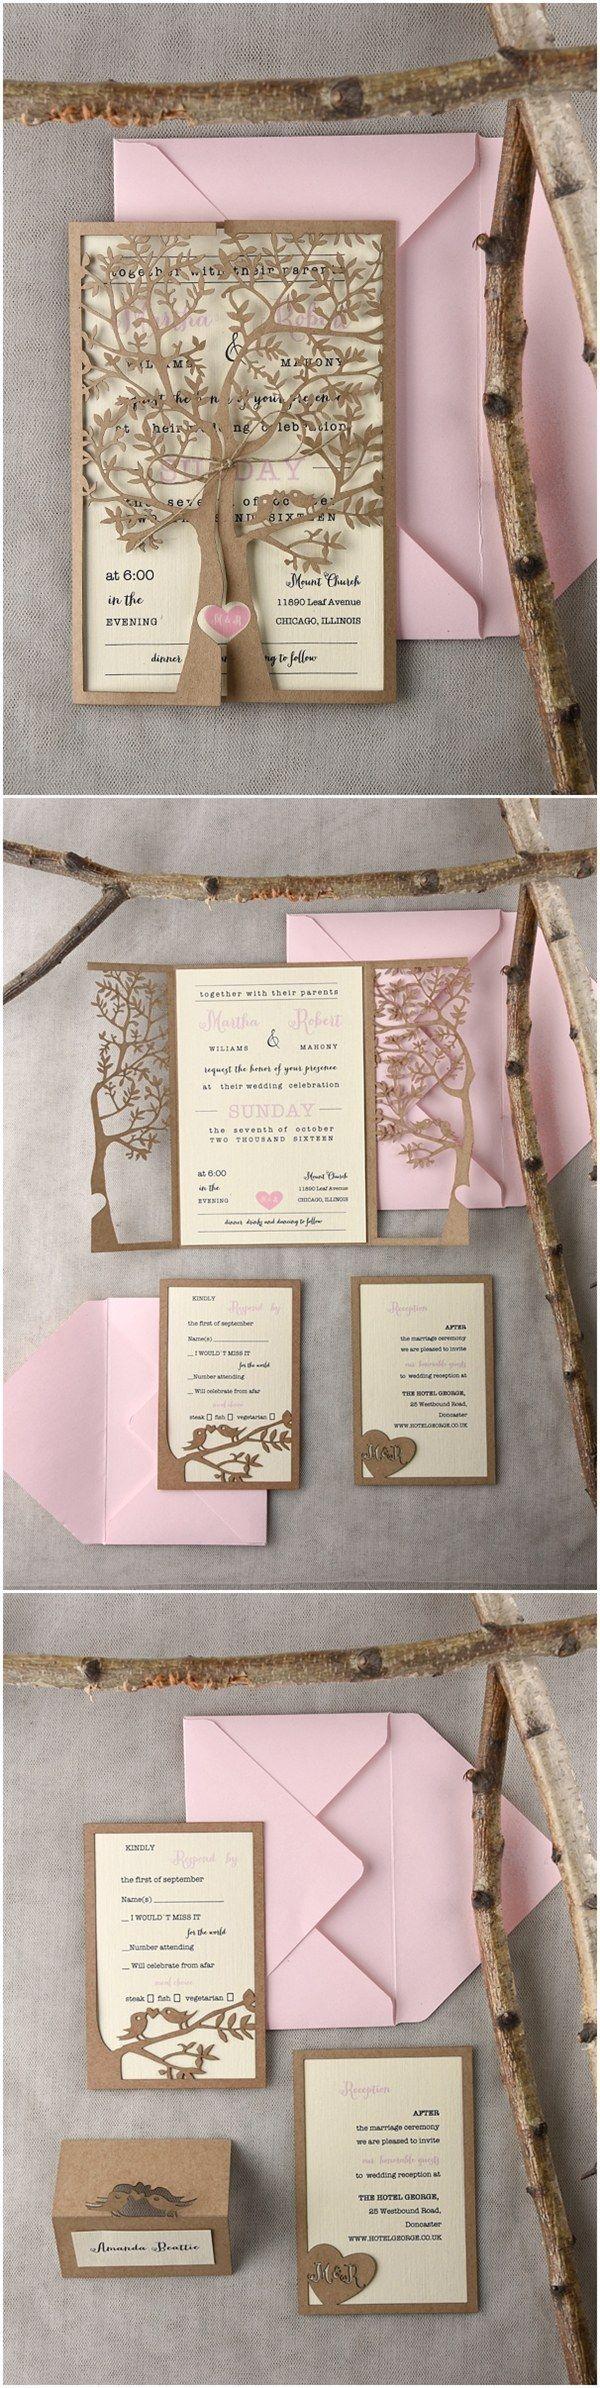 pink and gold wedding invitation kits%0A Rustic country laser cut tree gold and blush pink wedding invitations    LOVEPolkaDots